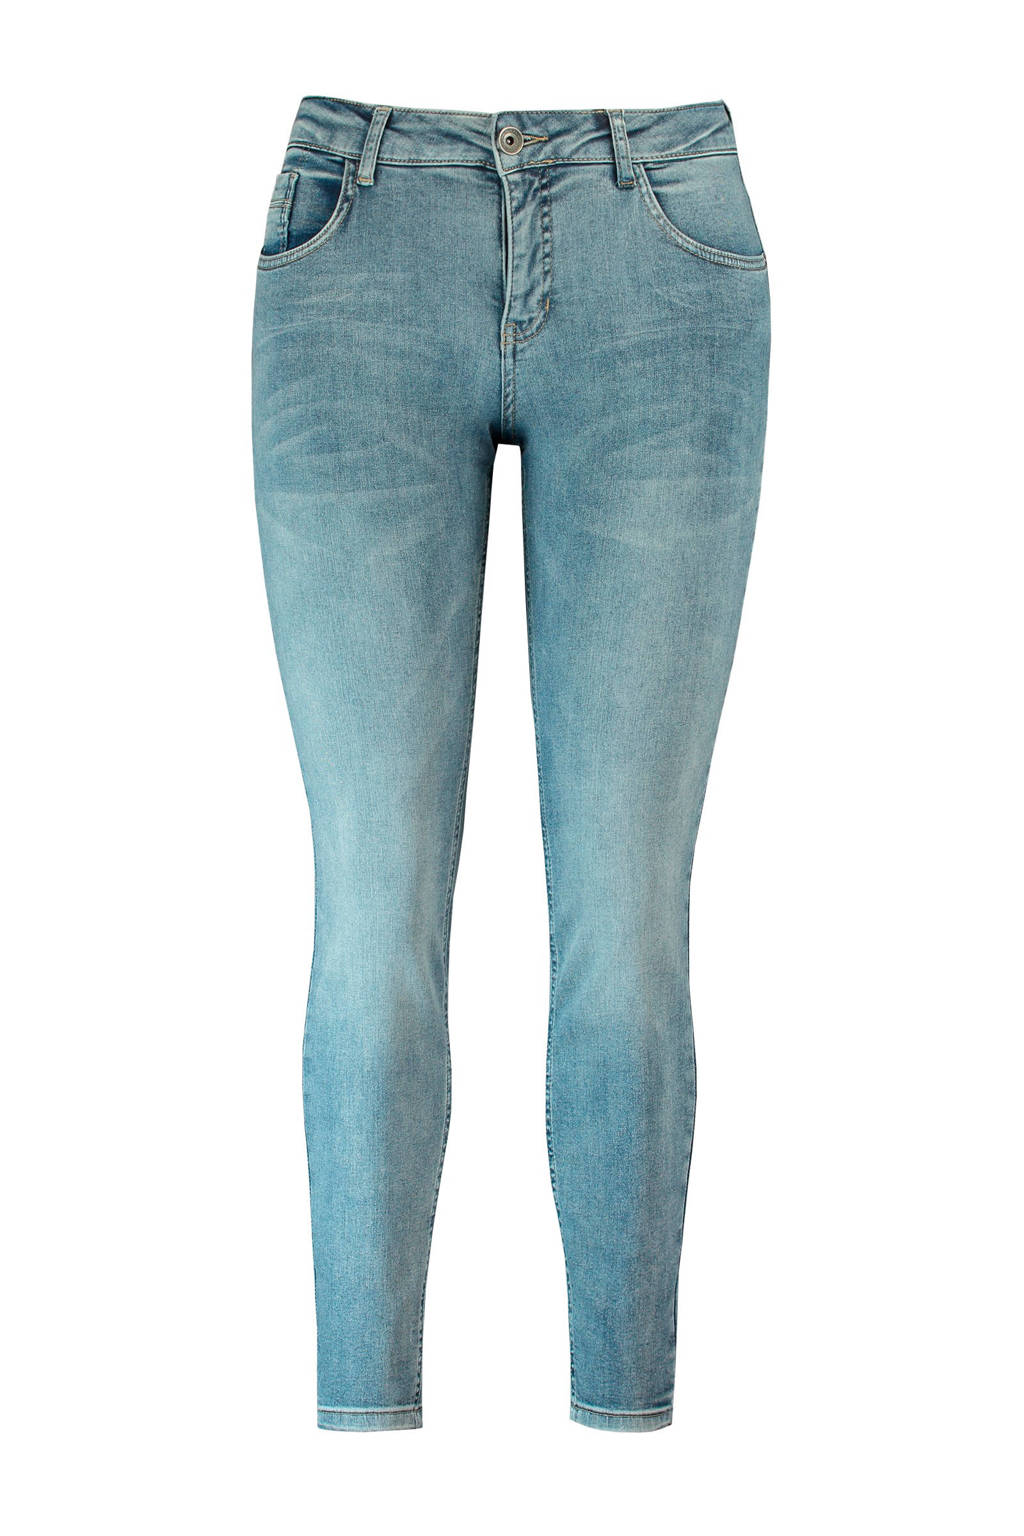 MS Mode slim fit jeans blauw, Blauw